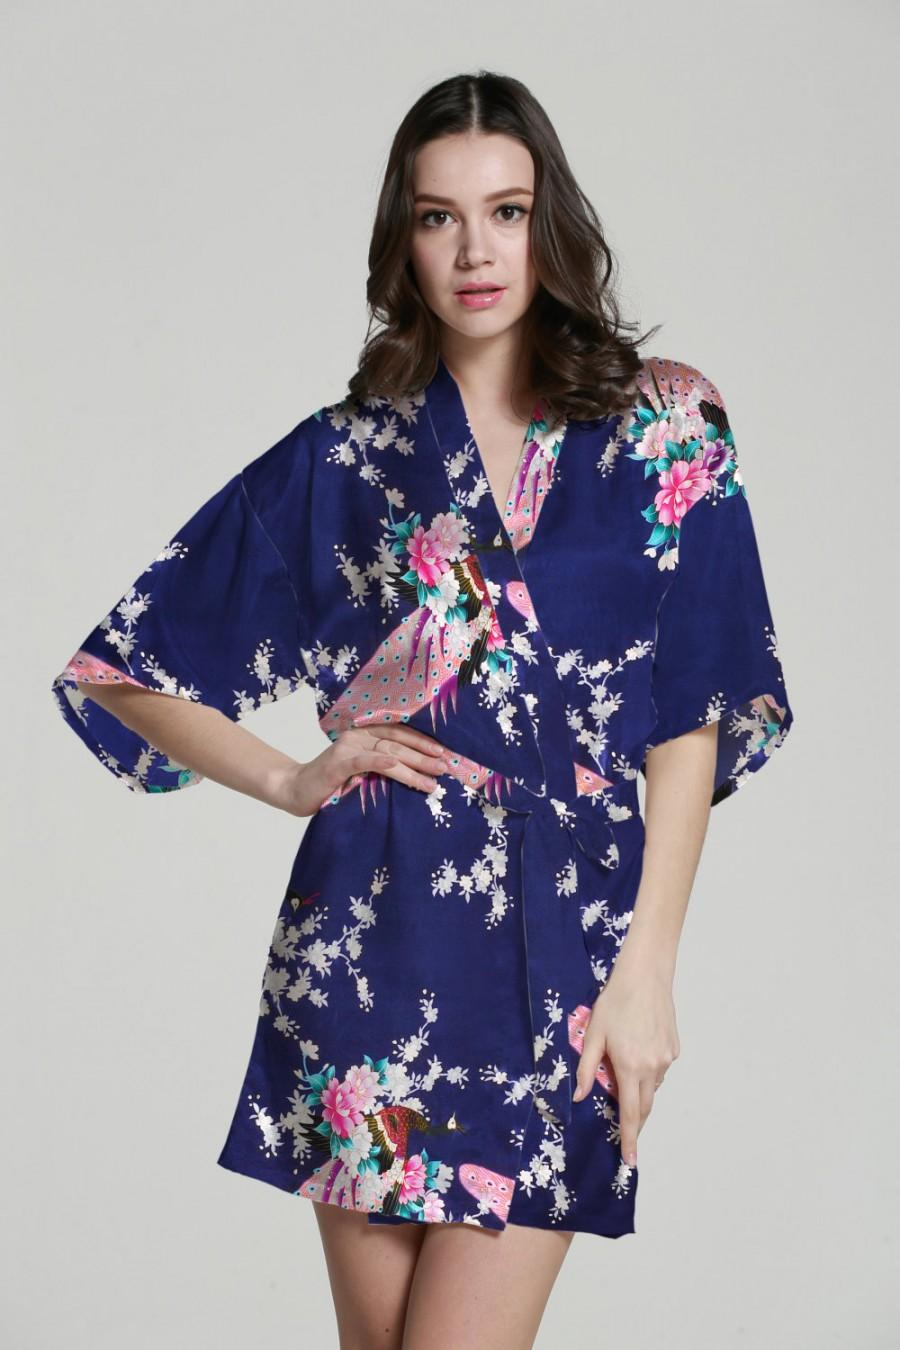 زفاف - Navy satin kimono wedding robes bridesmaids robes bride dresses personalized bridal robe sleepwear nightgown wedding party gifts